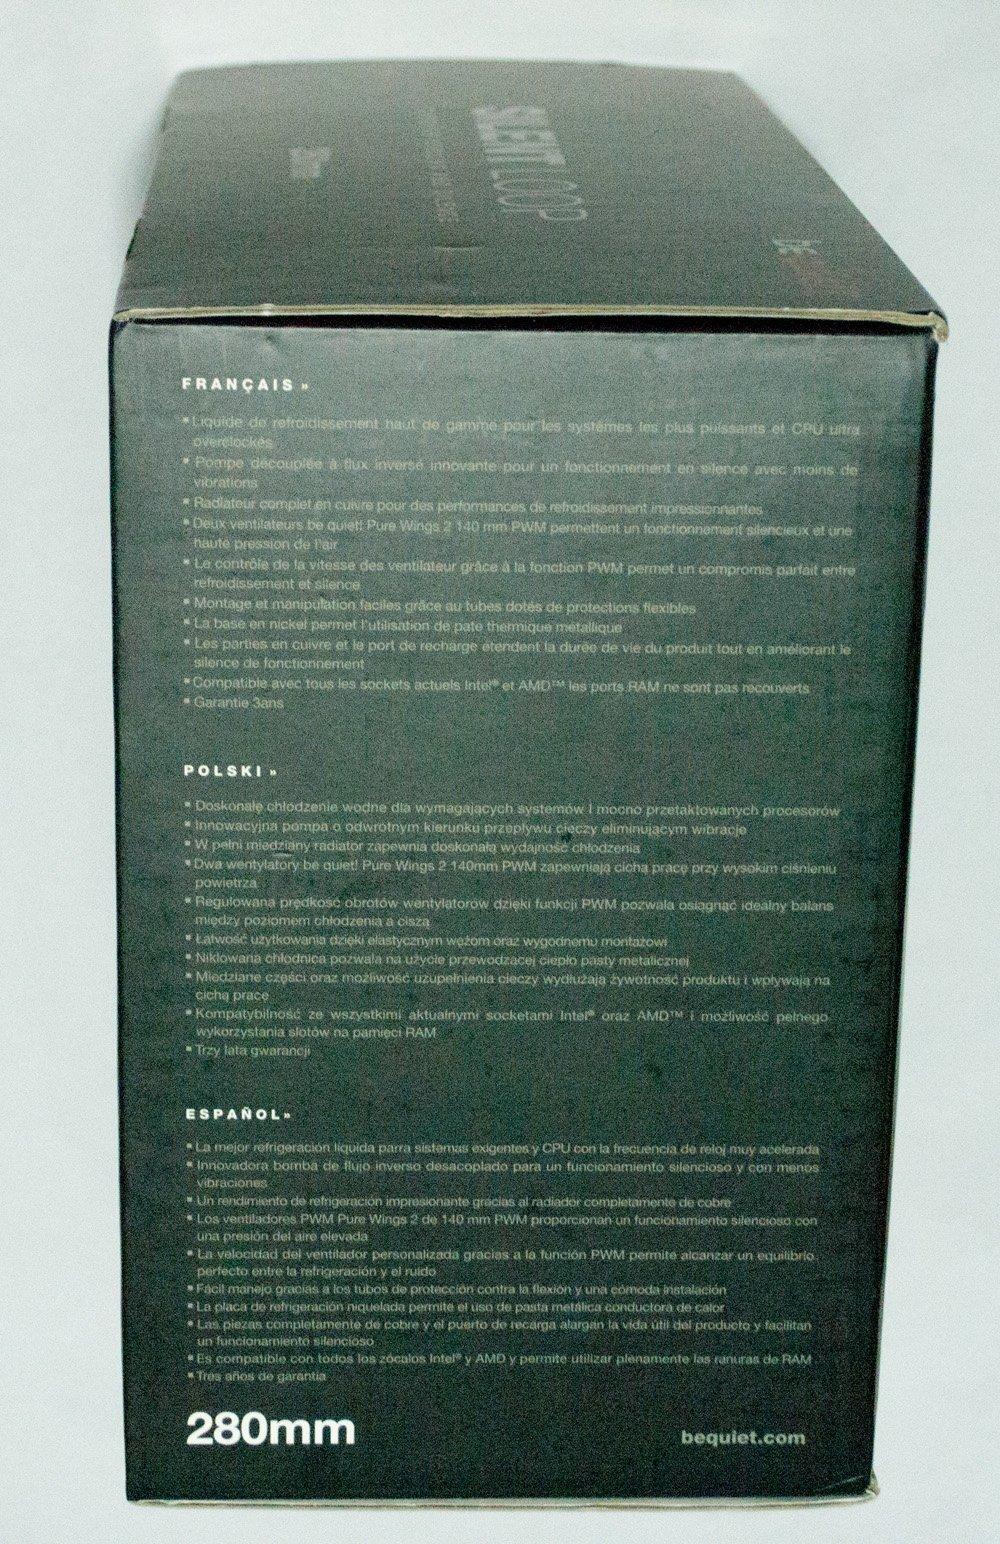 be-quiet-silent-loop-280mm-box-side2